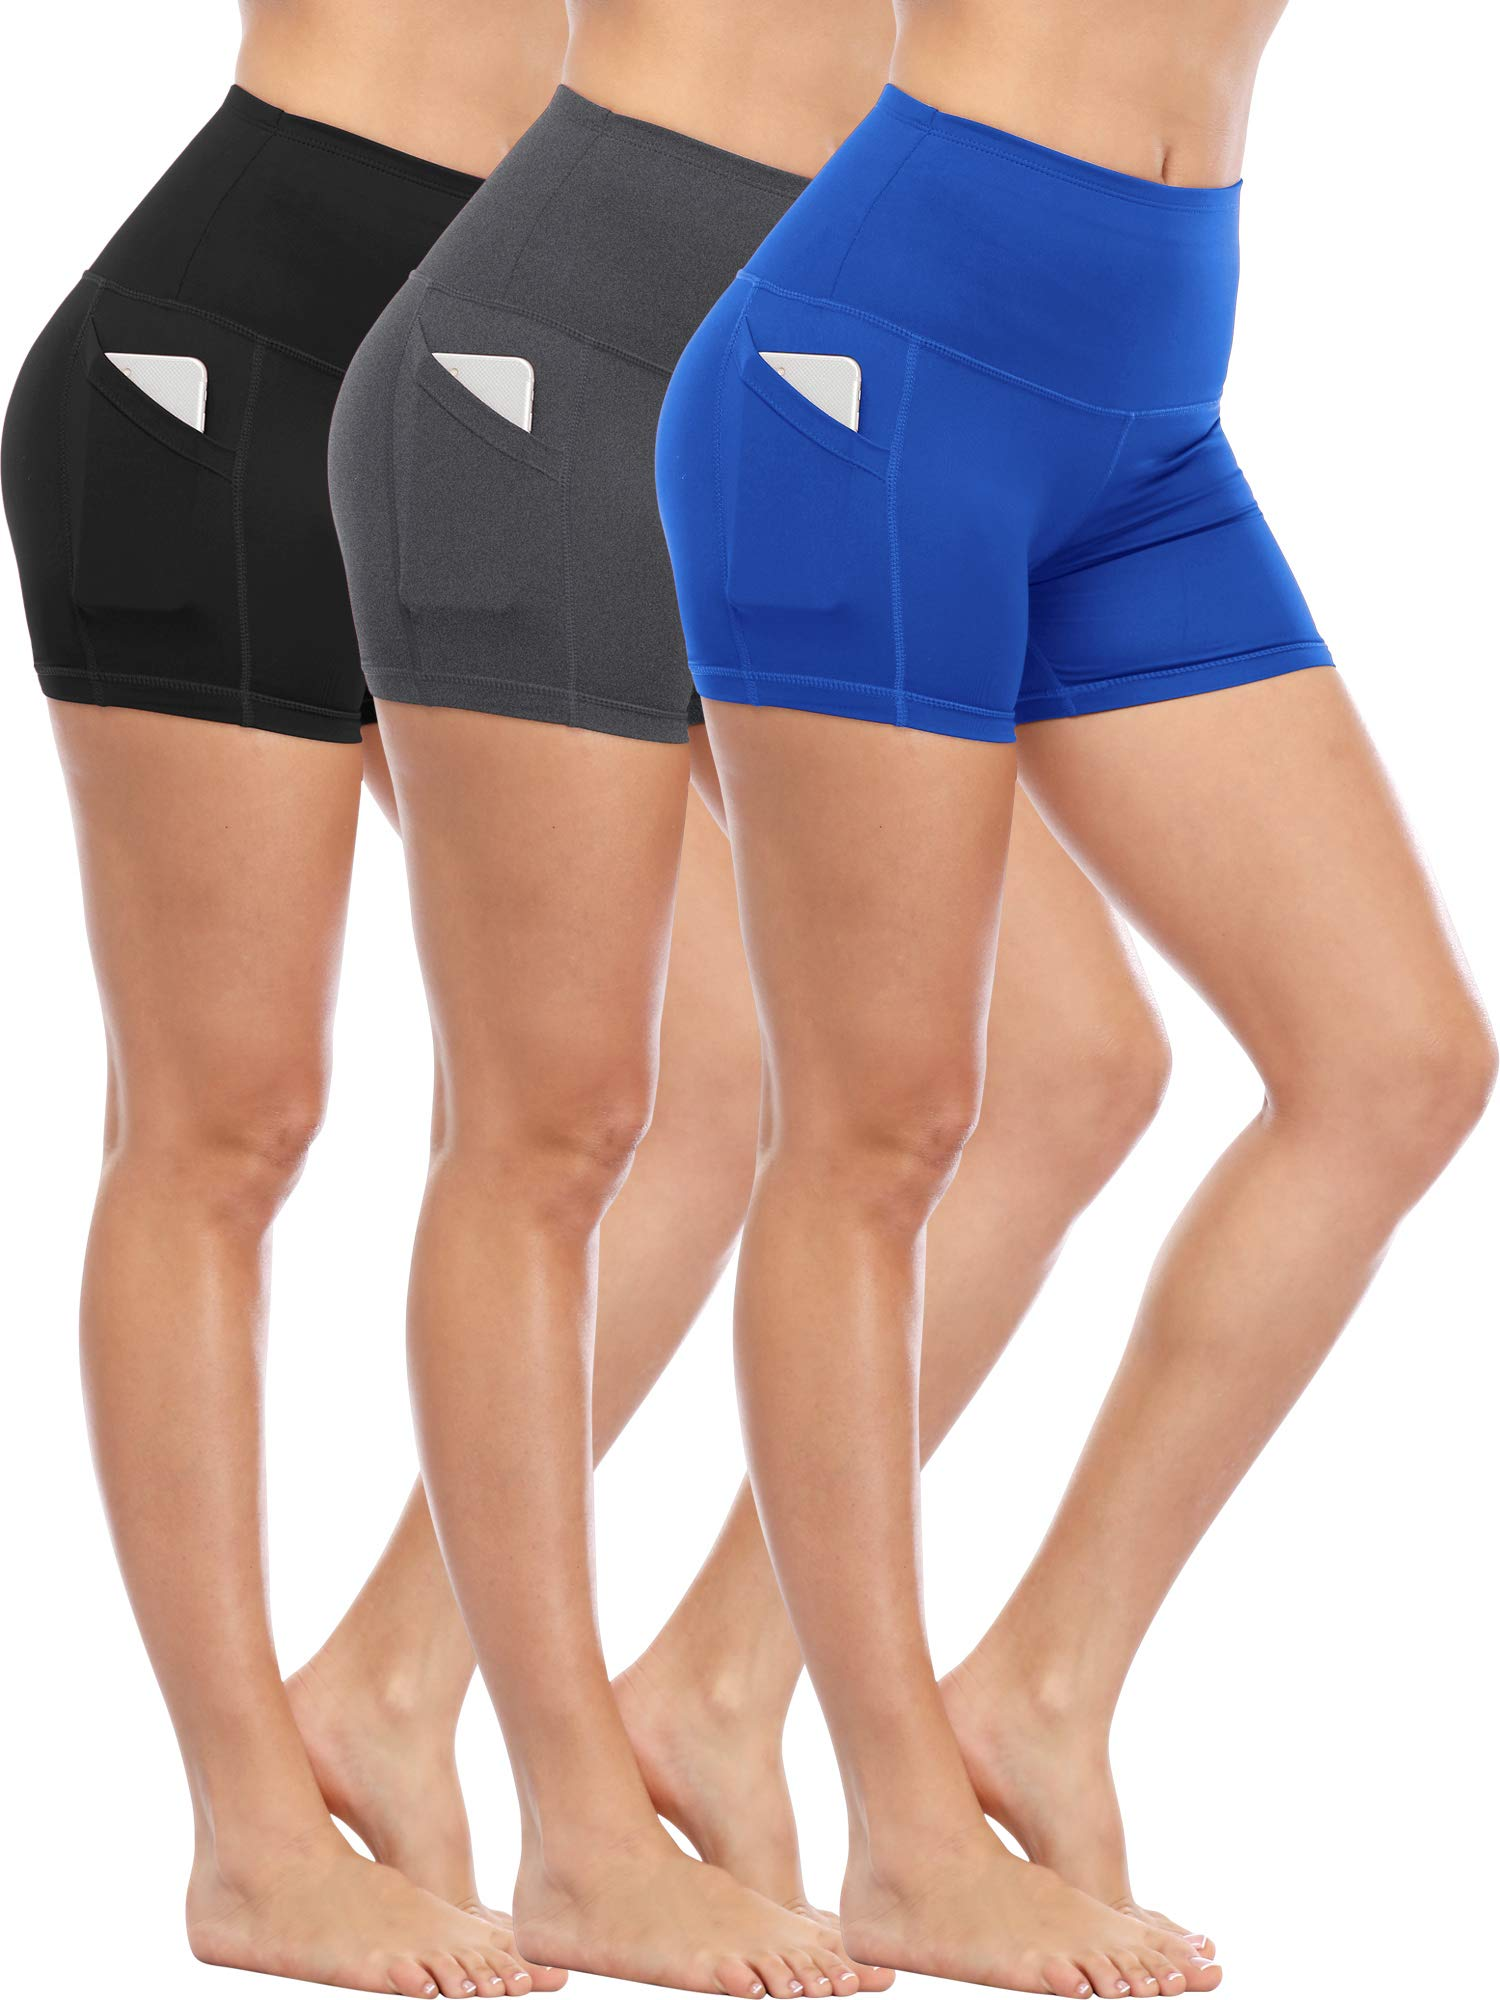 Cadmus Women's Tummy Control Workout Running Short Out Pocket,3 Pack,1016,Black & Grey & Blue,Medium by Cadmus